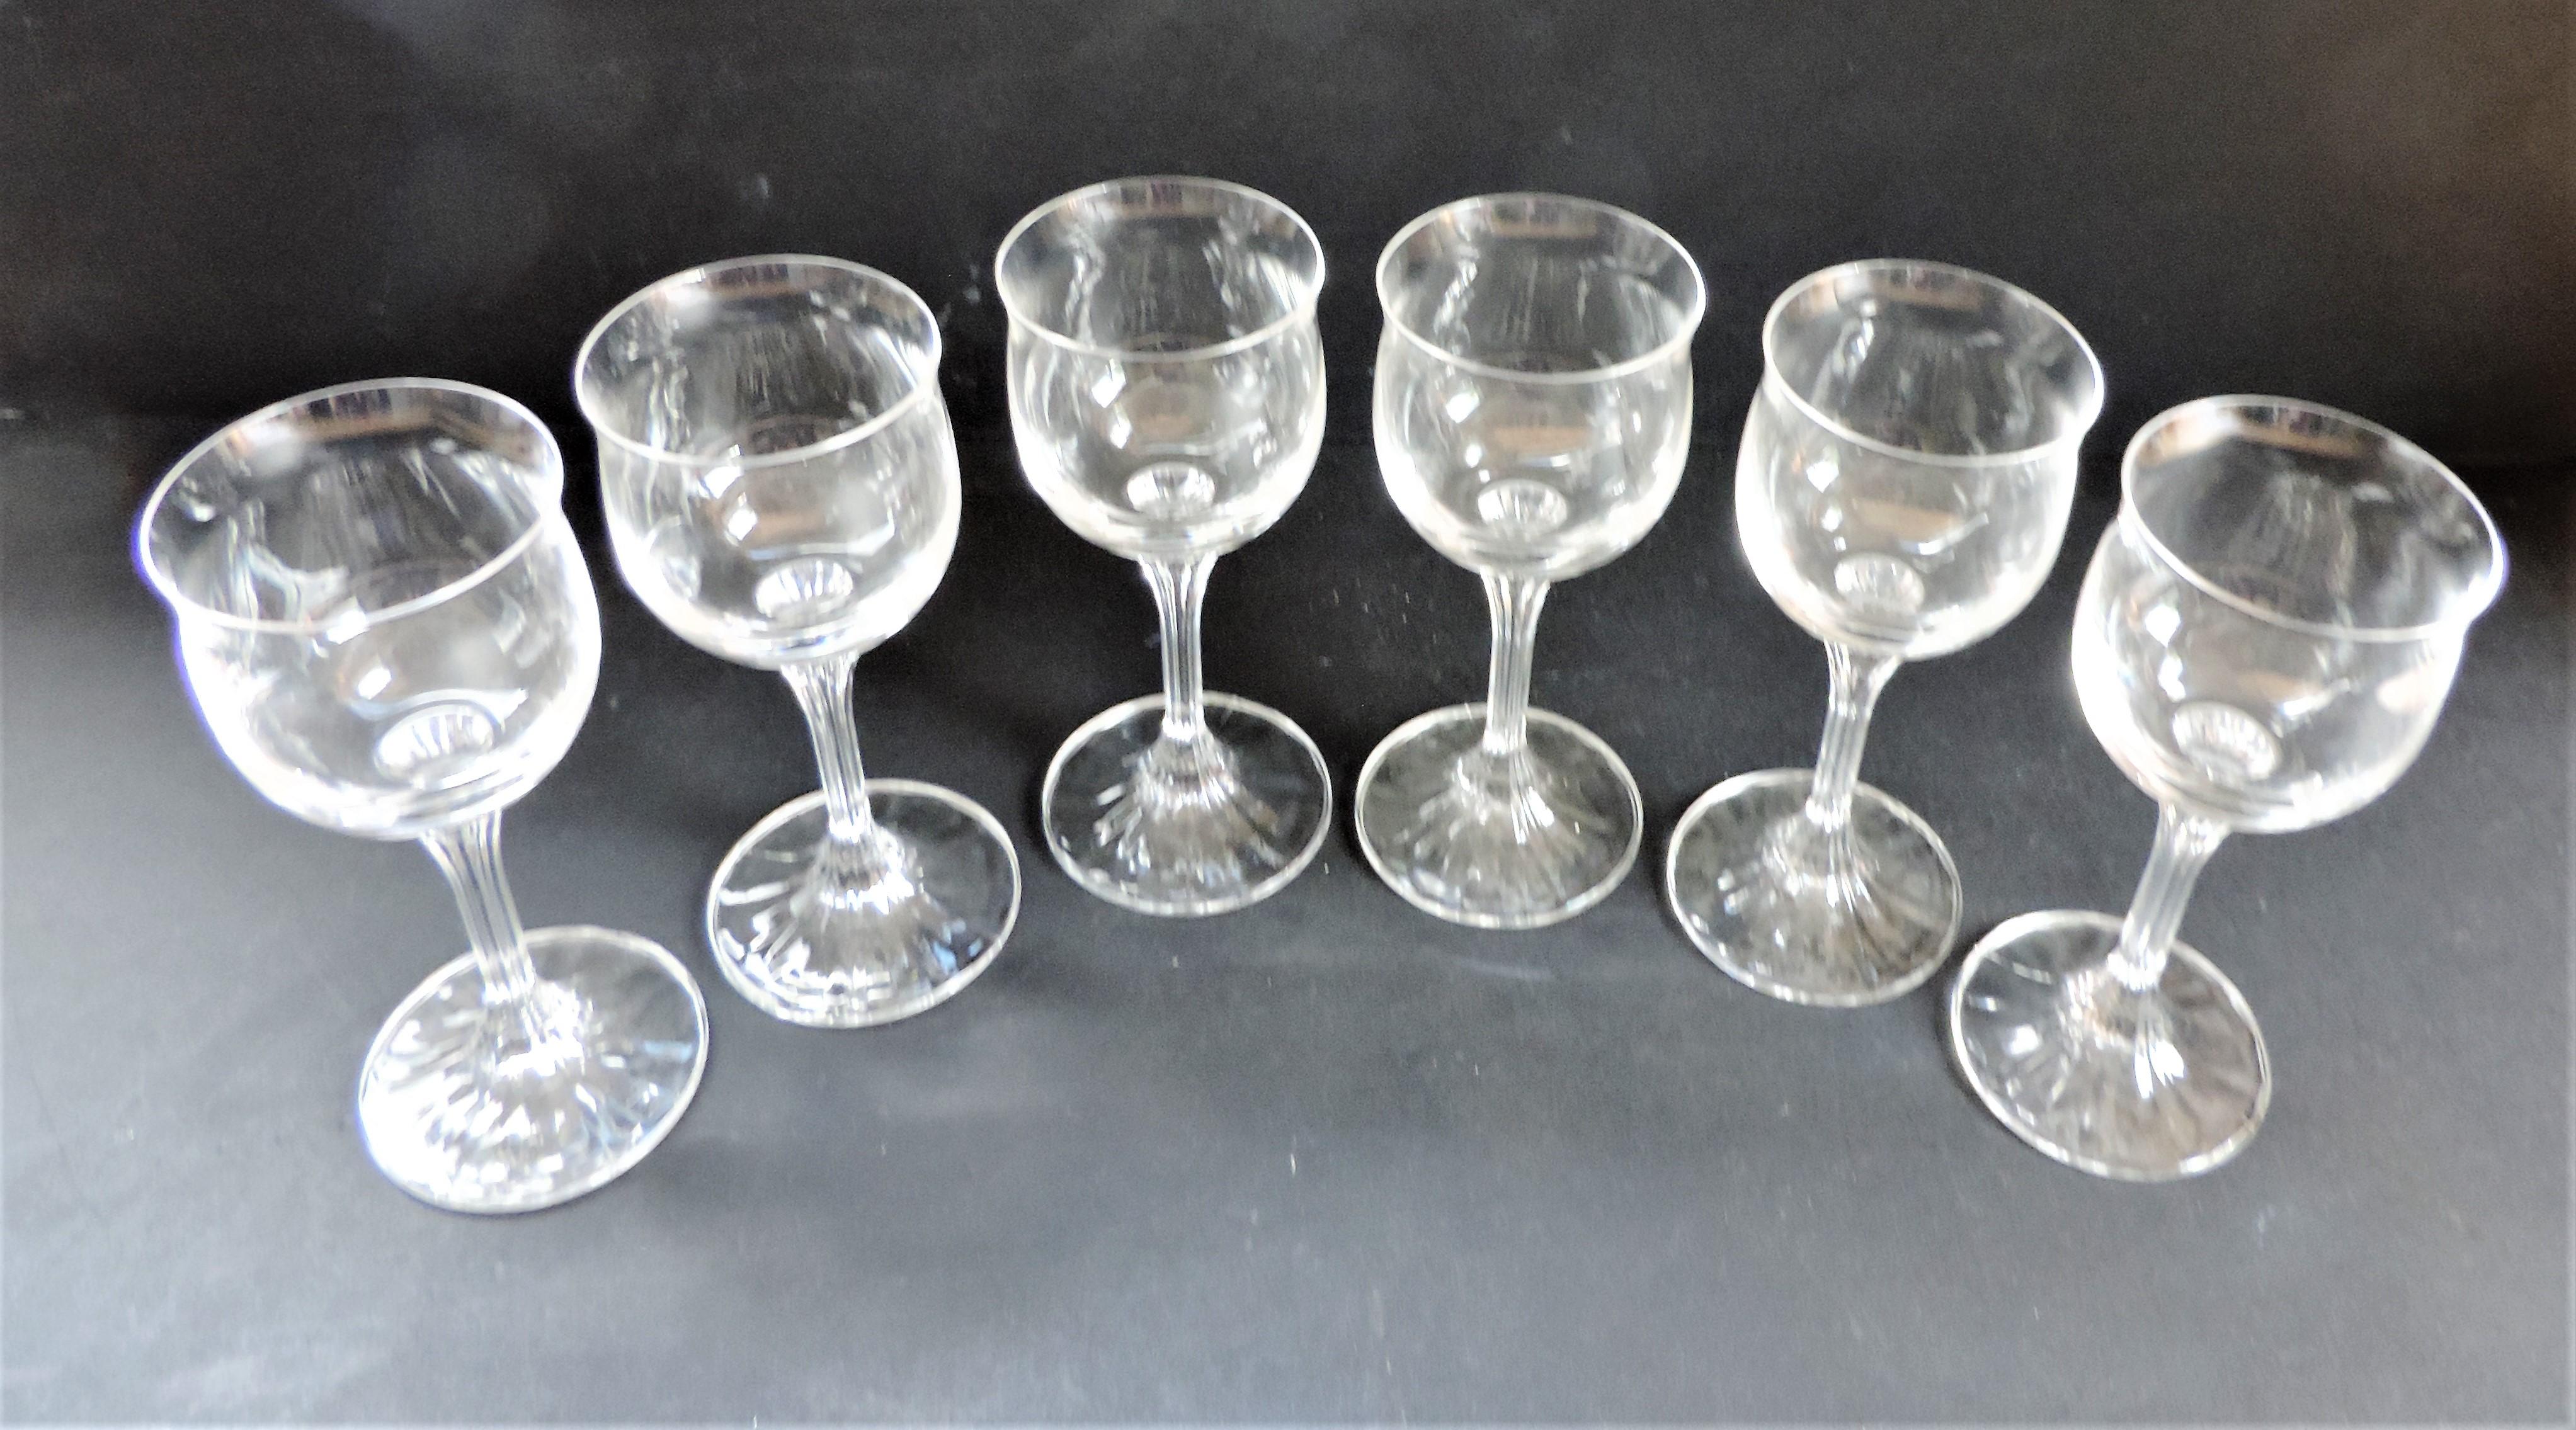 Set 6 Crystal Wine Glasses - Image 2 of 4